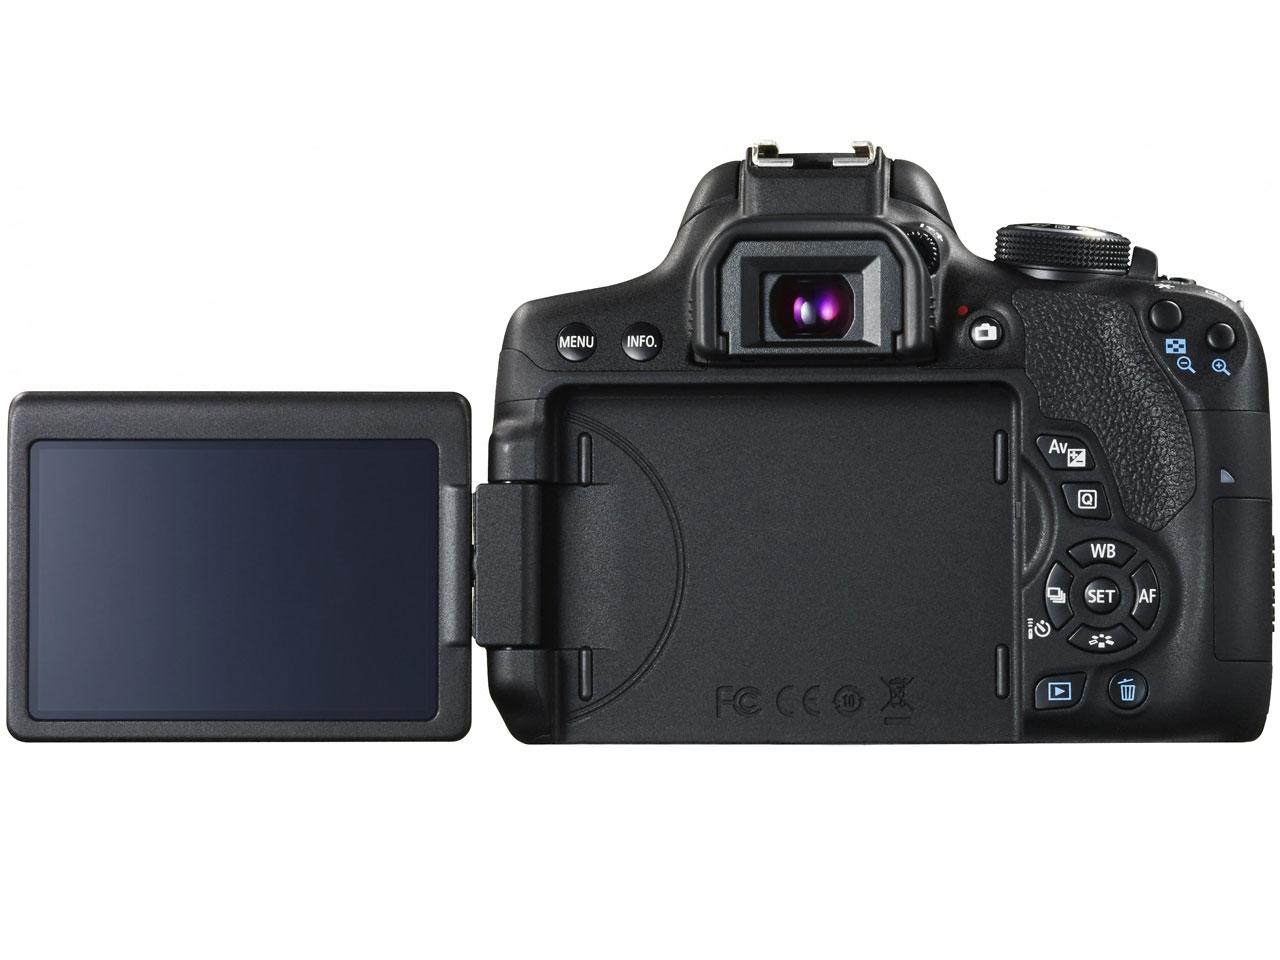 Canon デジタル一眼レフカメラ EOS Kiss X8i ボディ 2420万画素 EOSKISSX8I キヤノン イオス